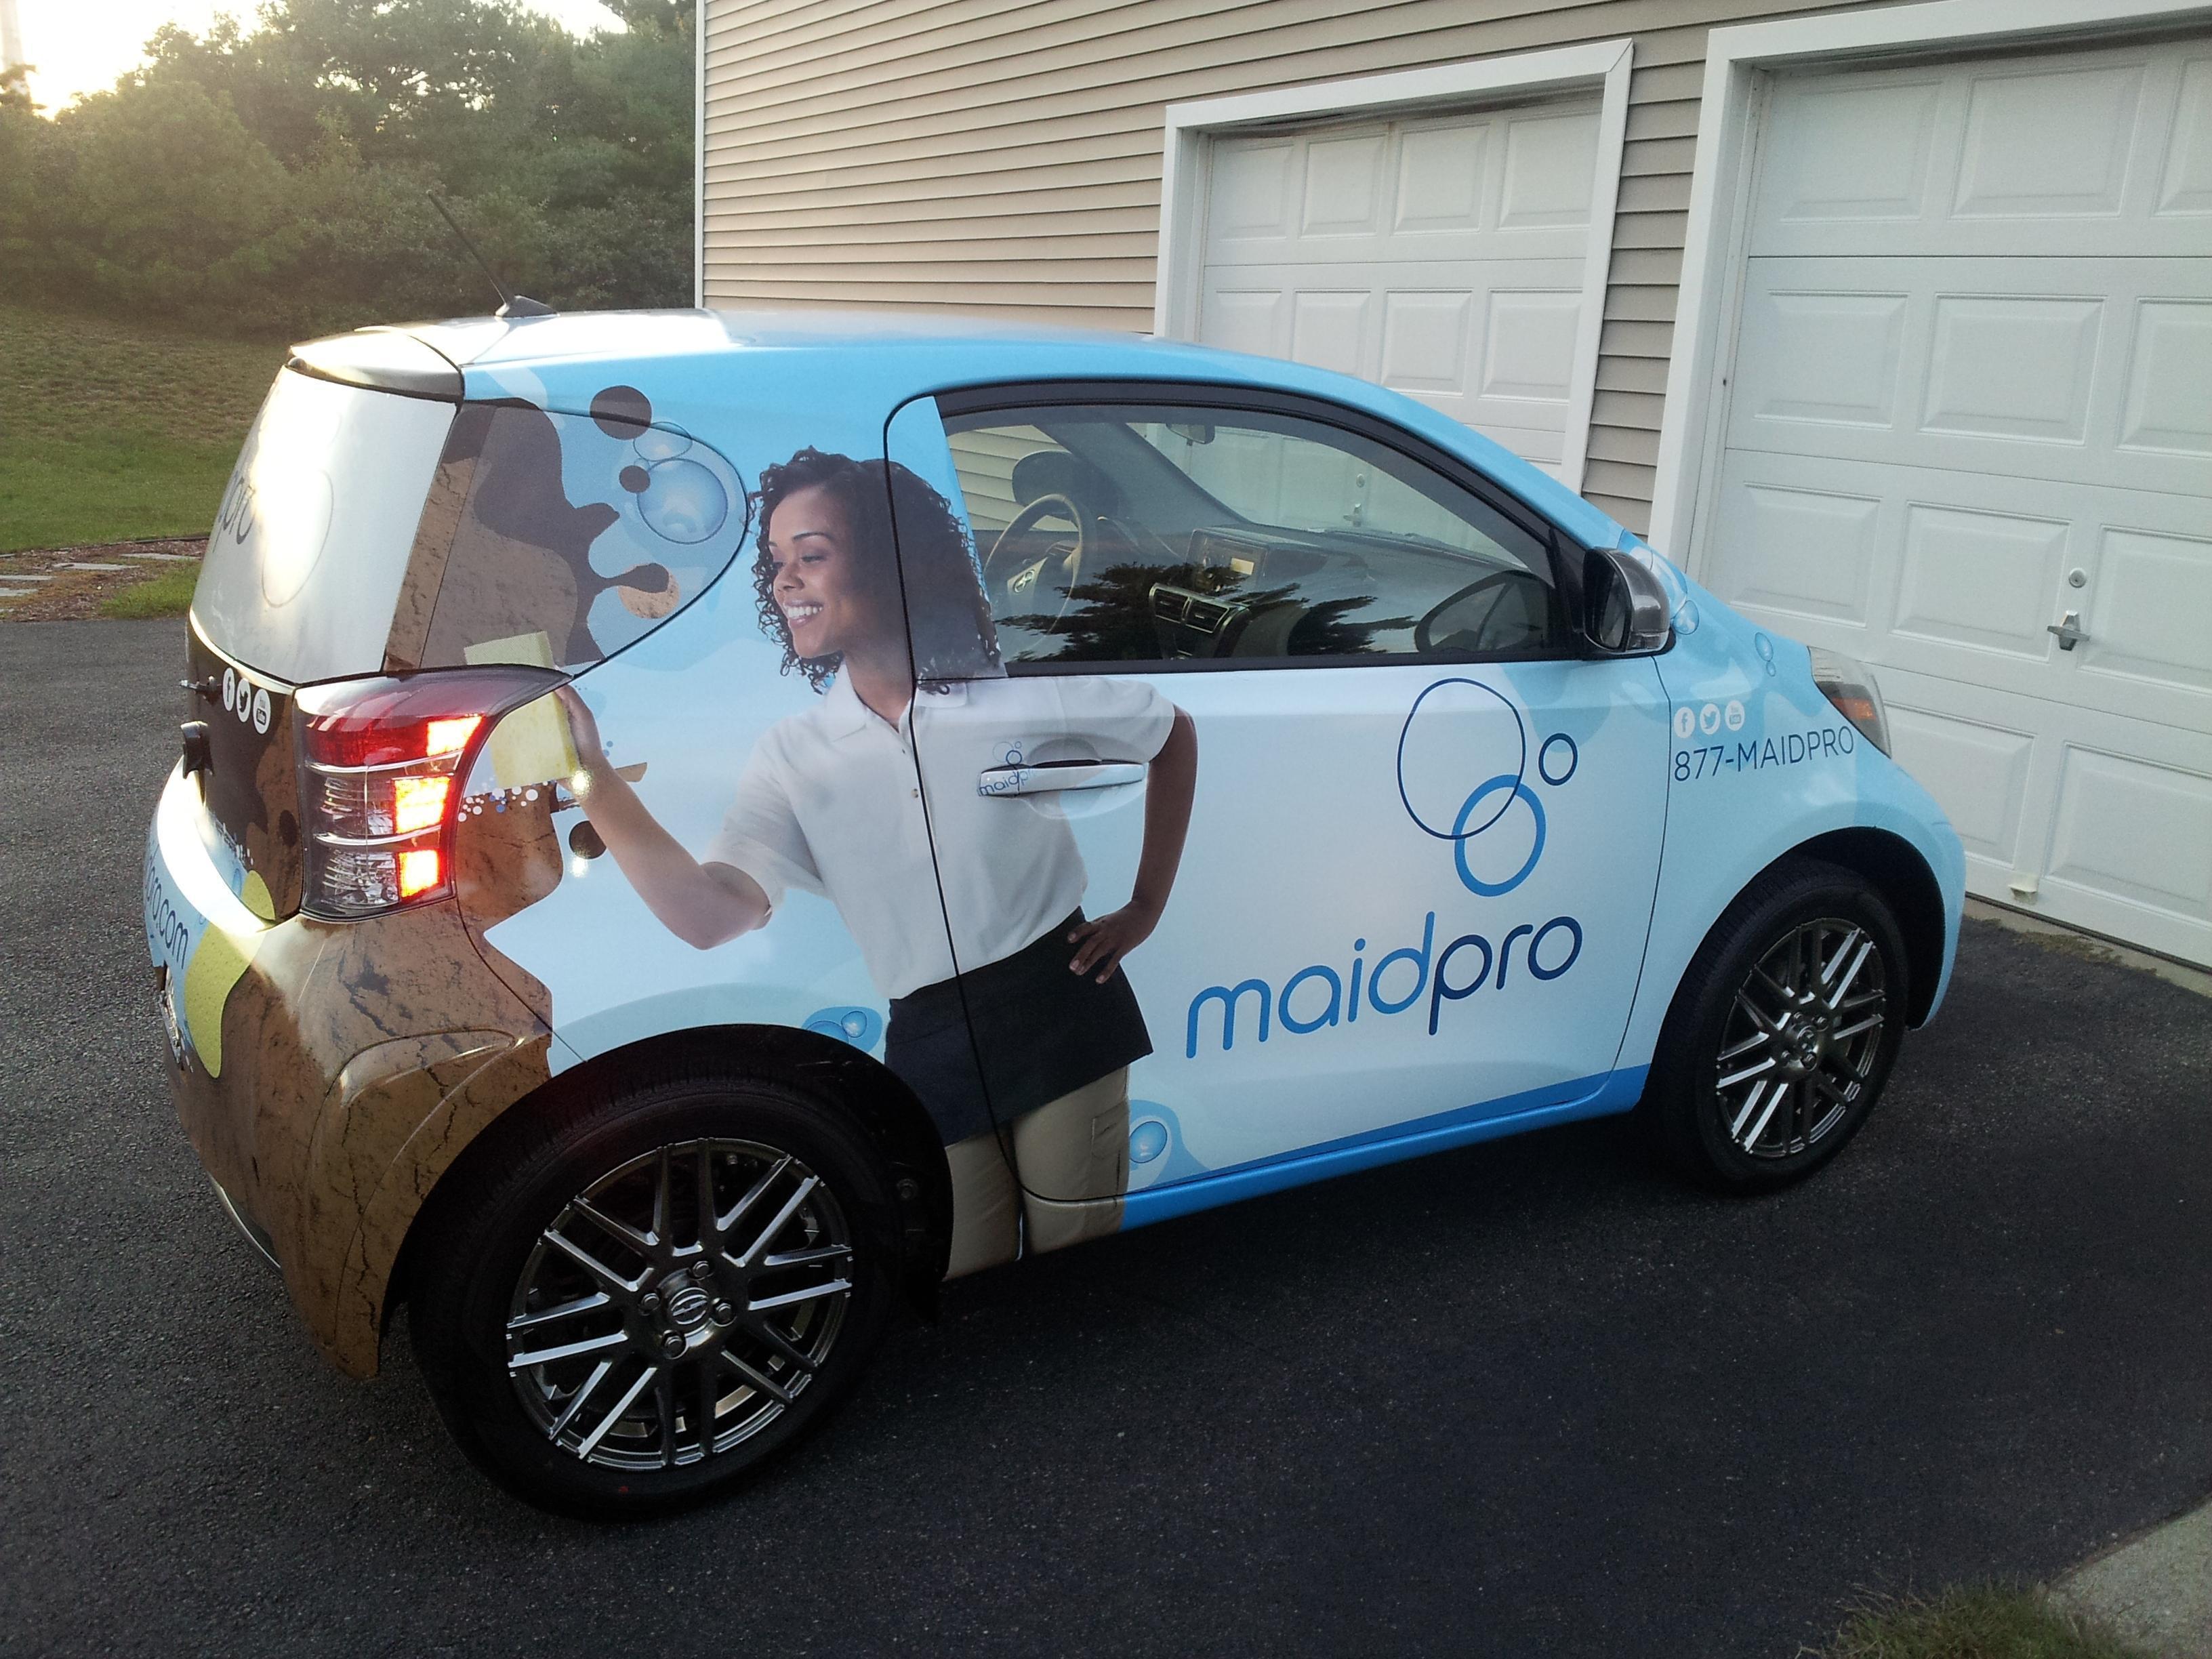 MaidPro - ad image